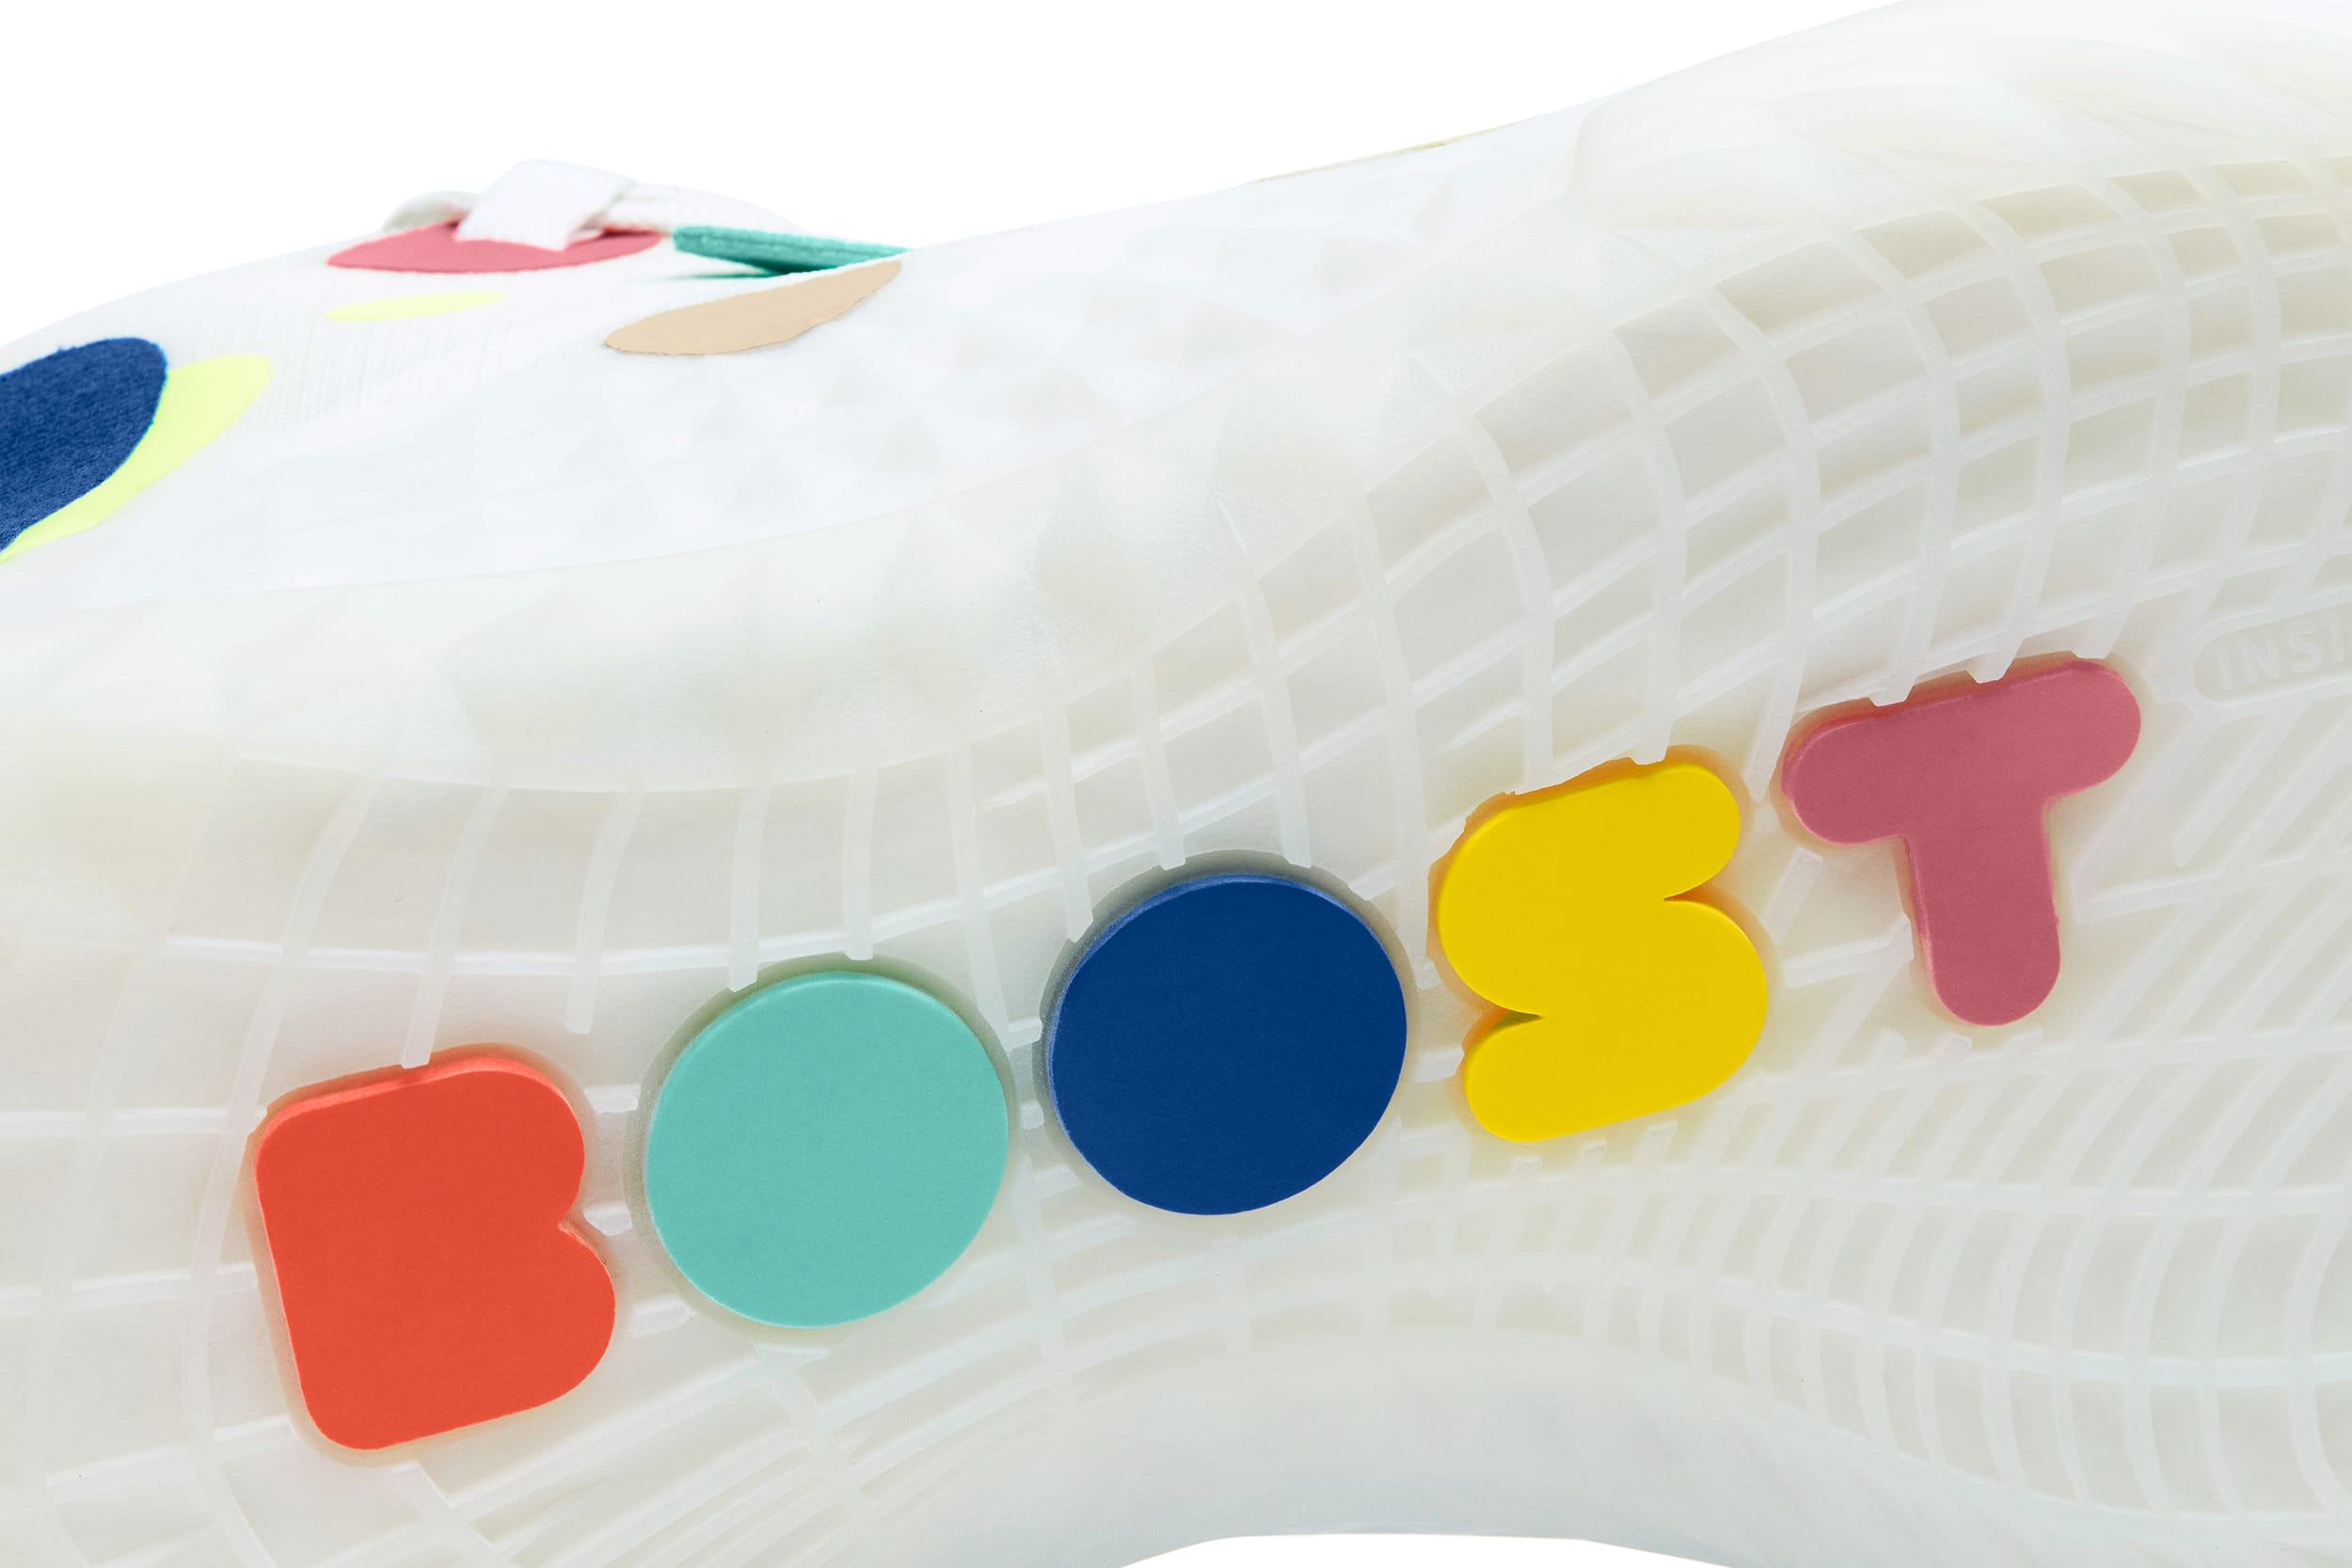 Adidas Harden Vol. 5 Outsole